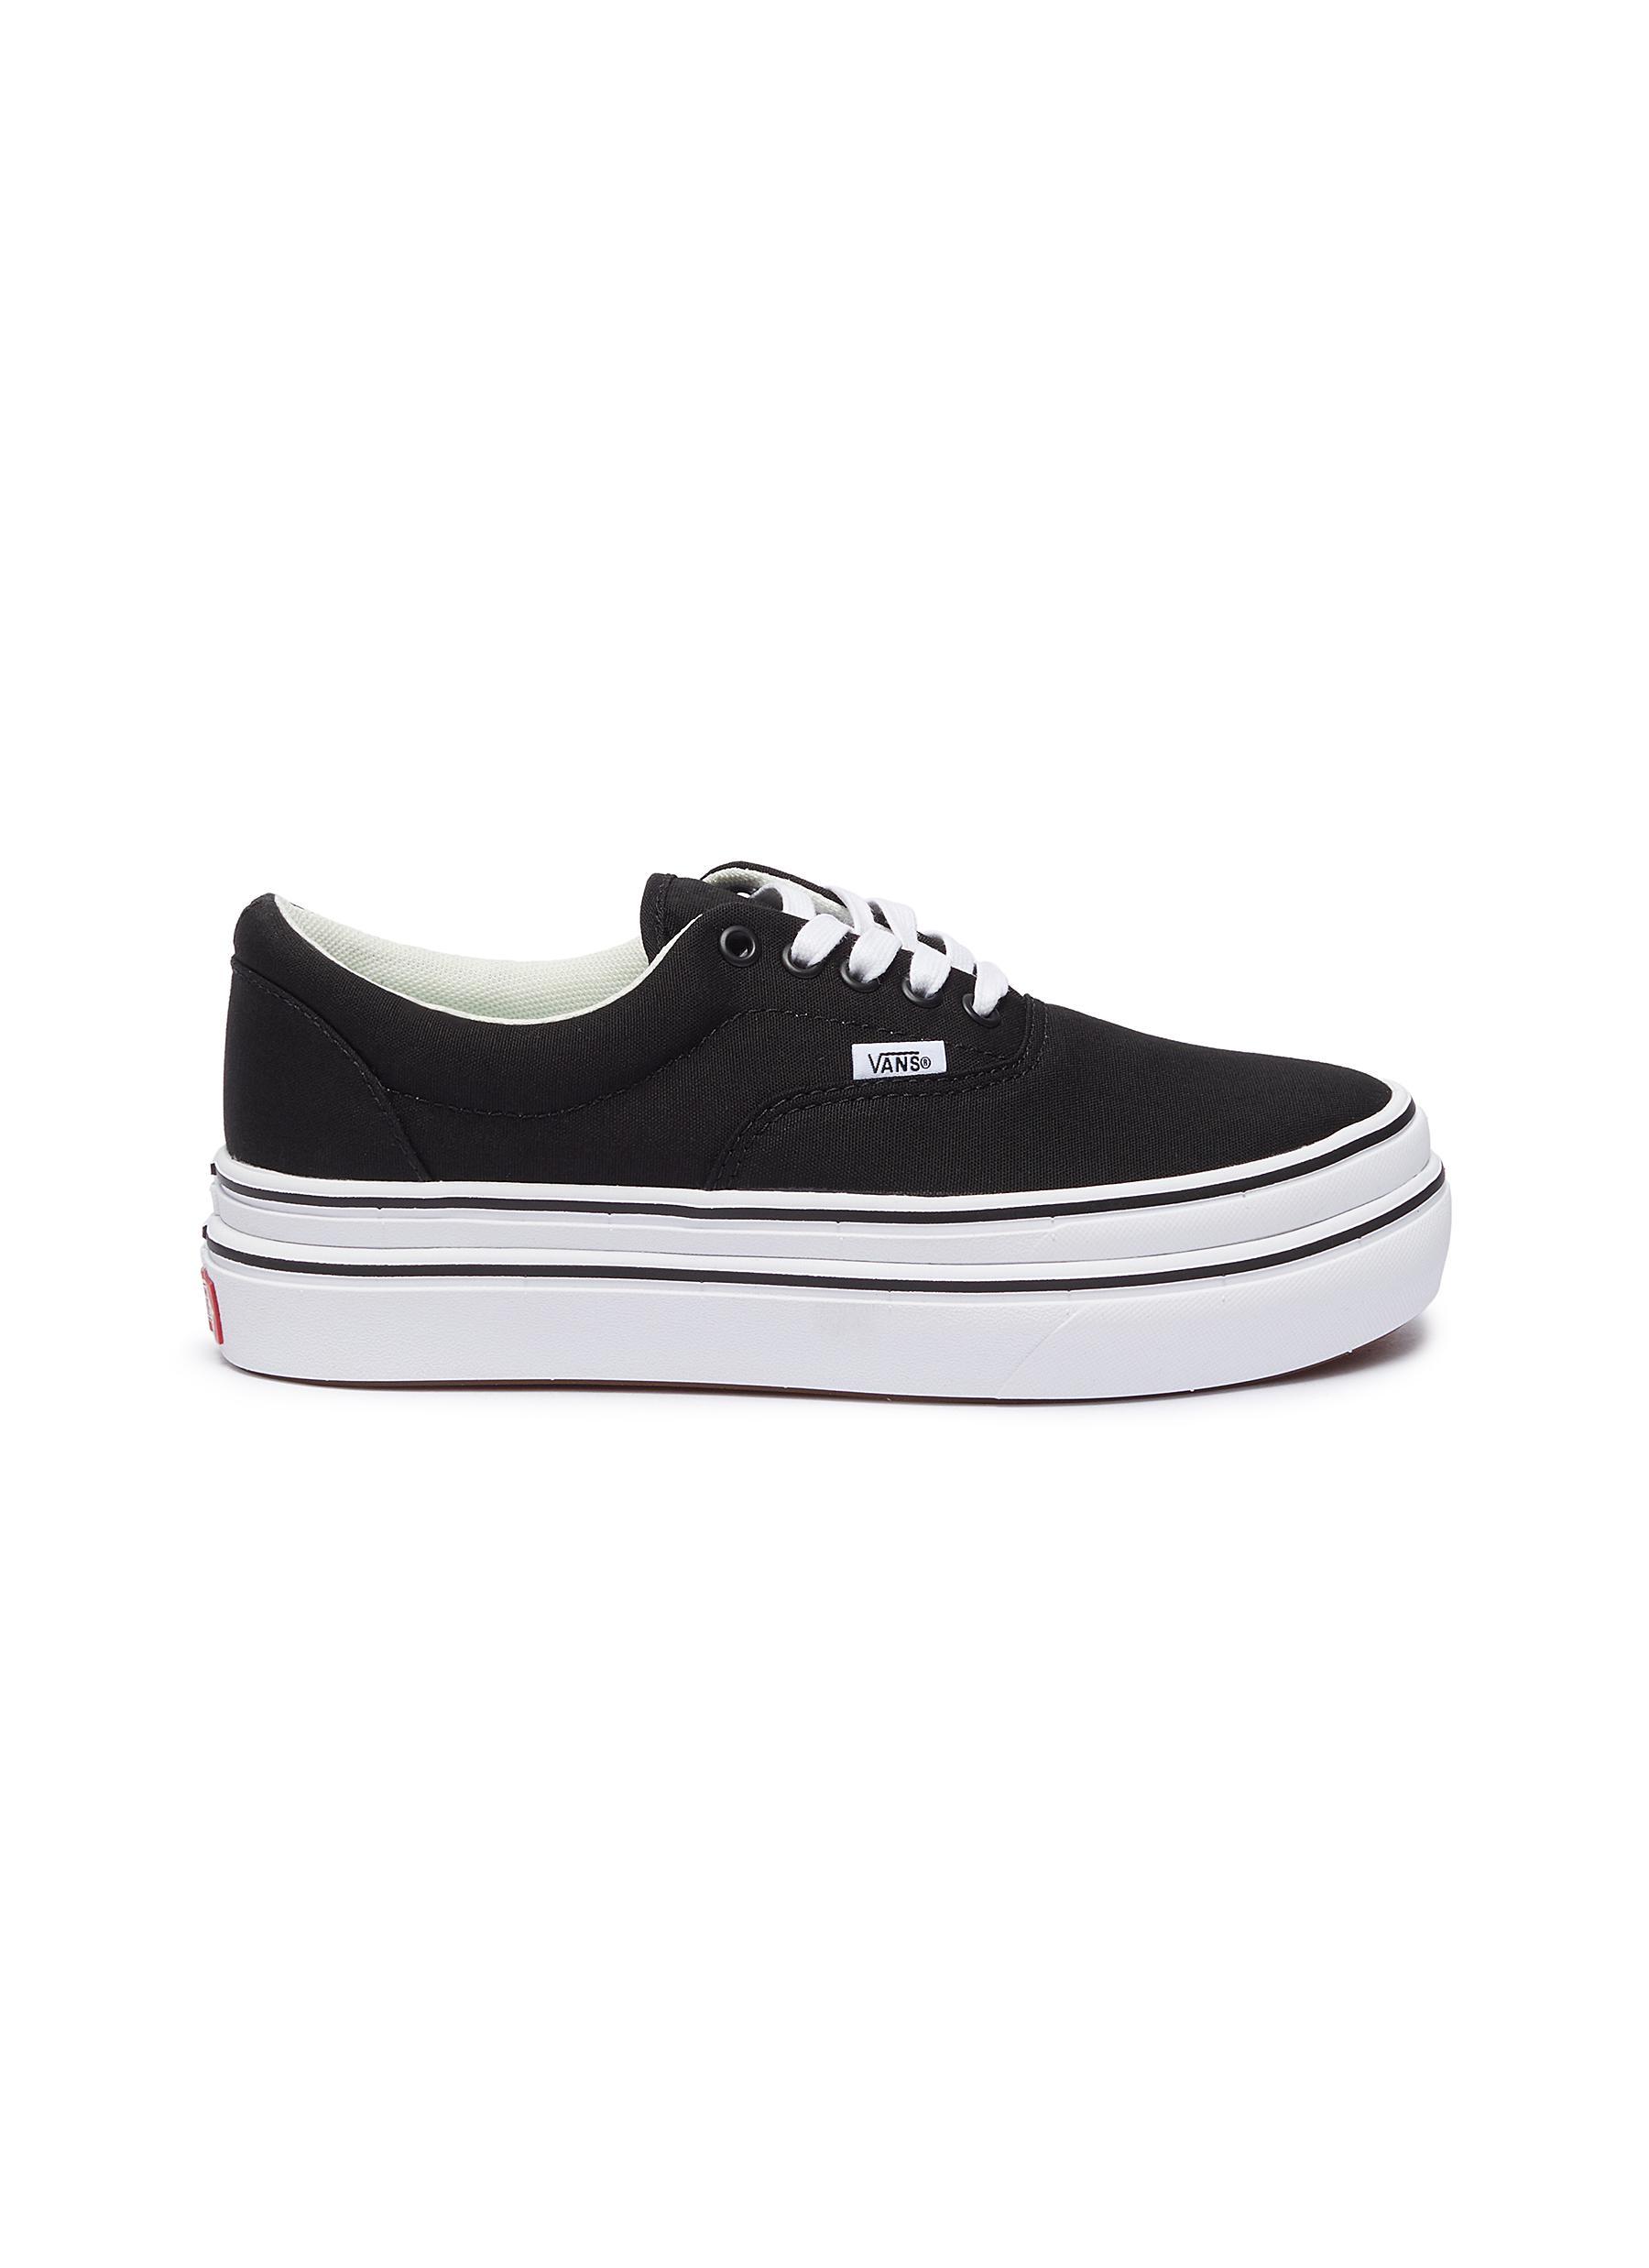 Vans Sneakers Super Comfycush Era canvas skate sneakers